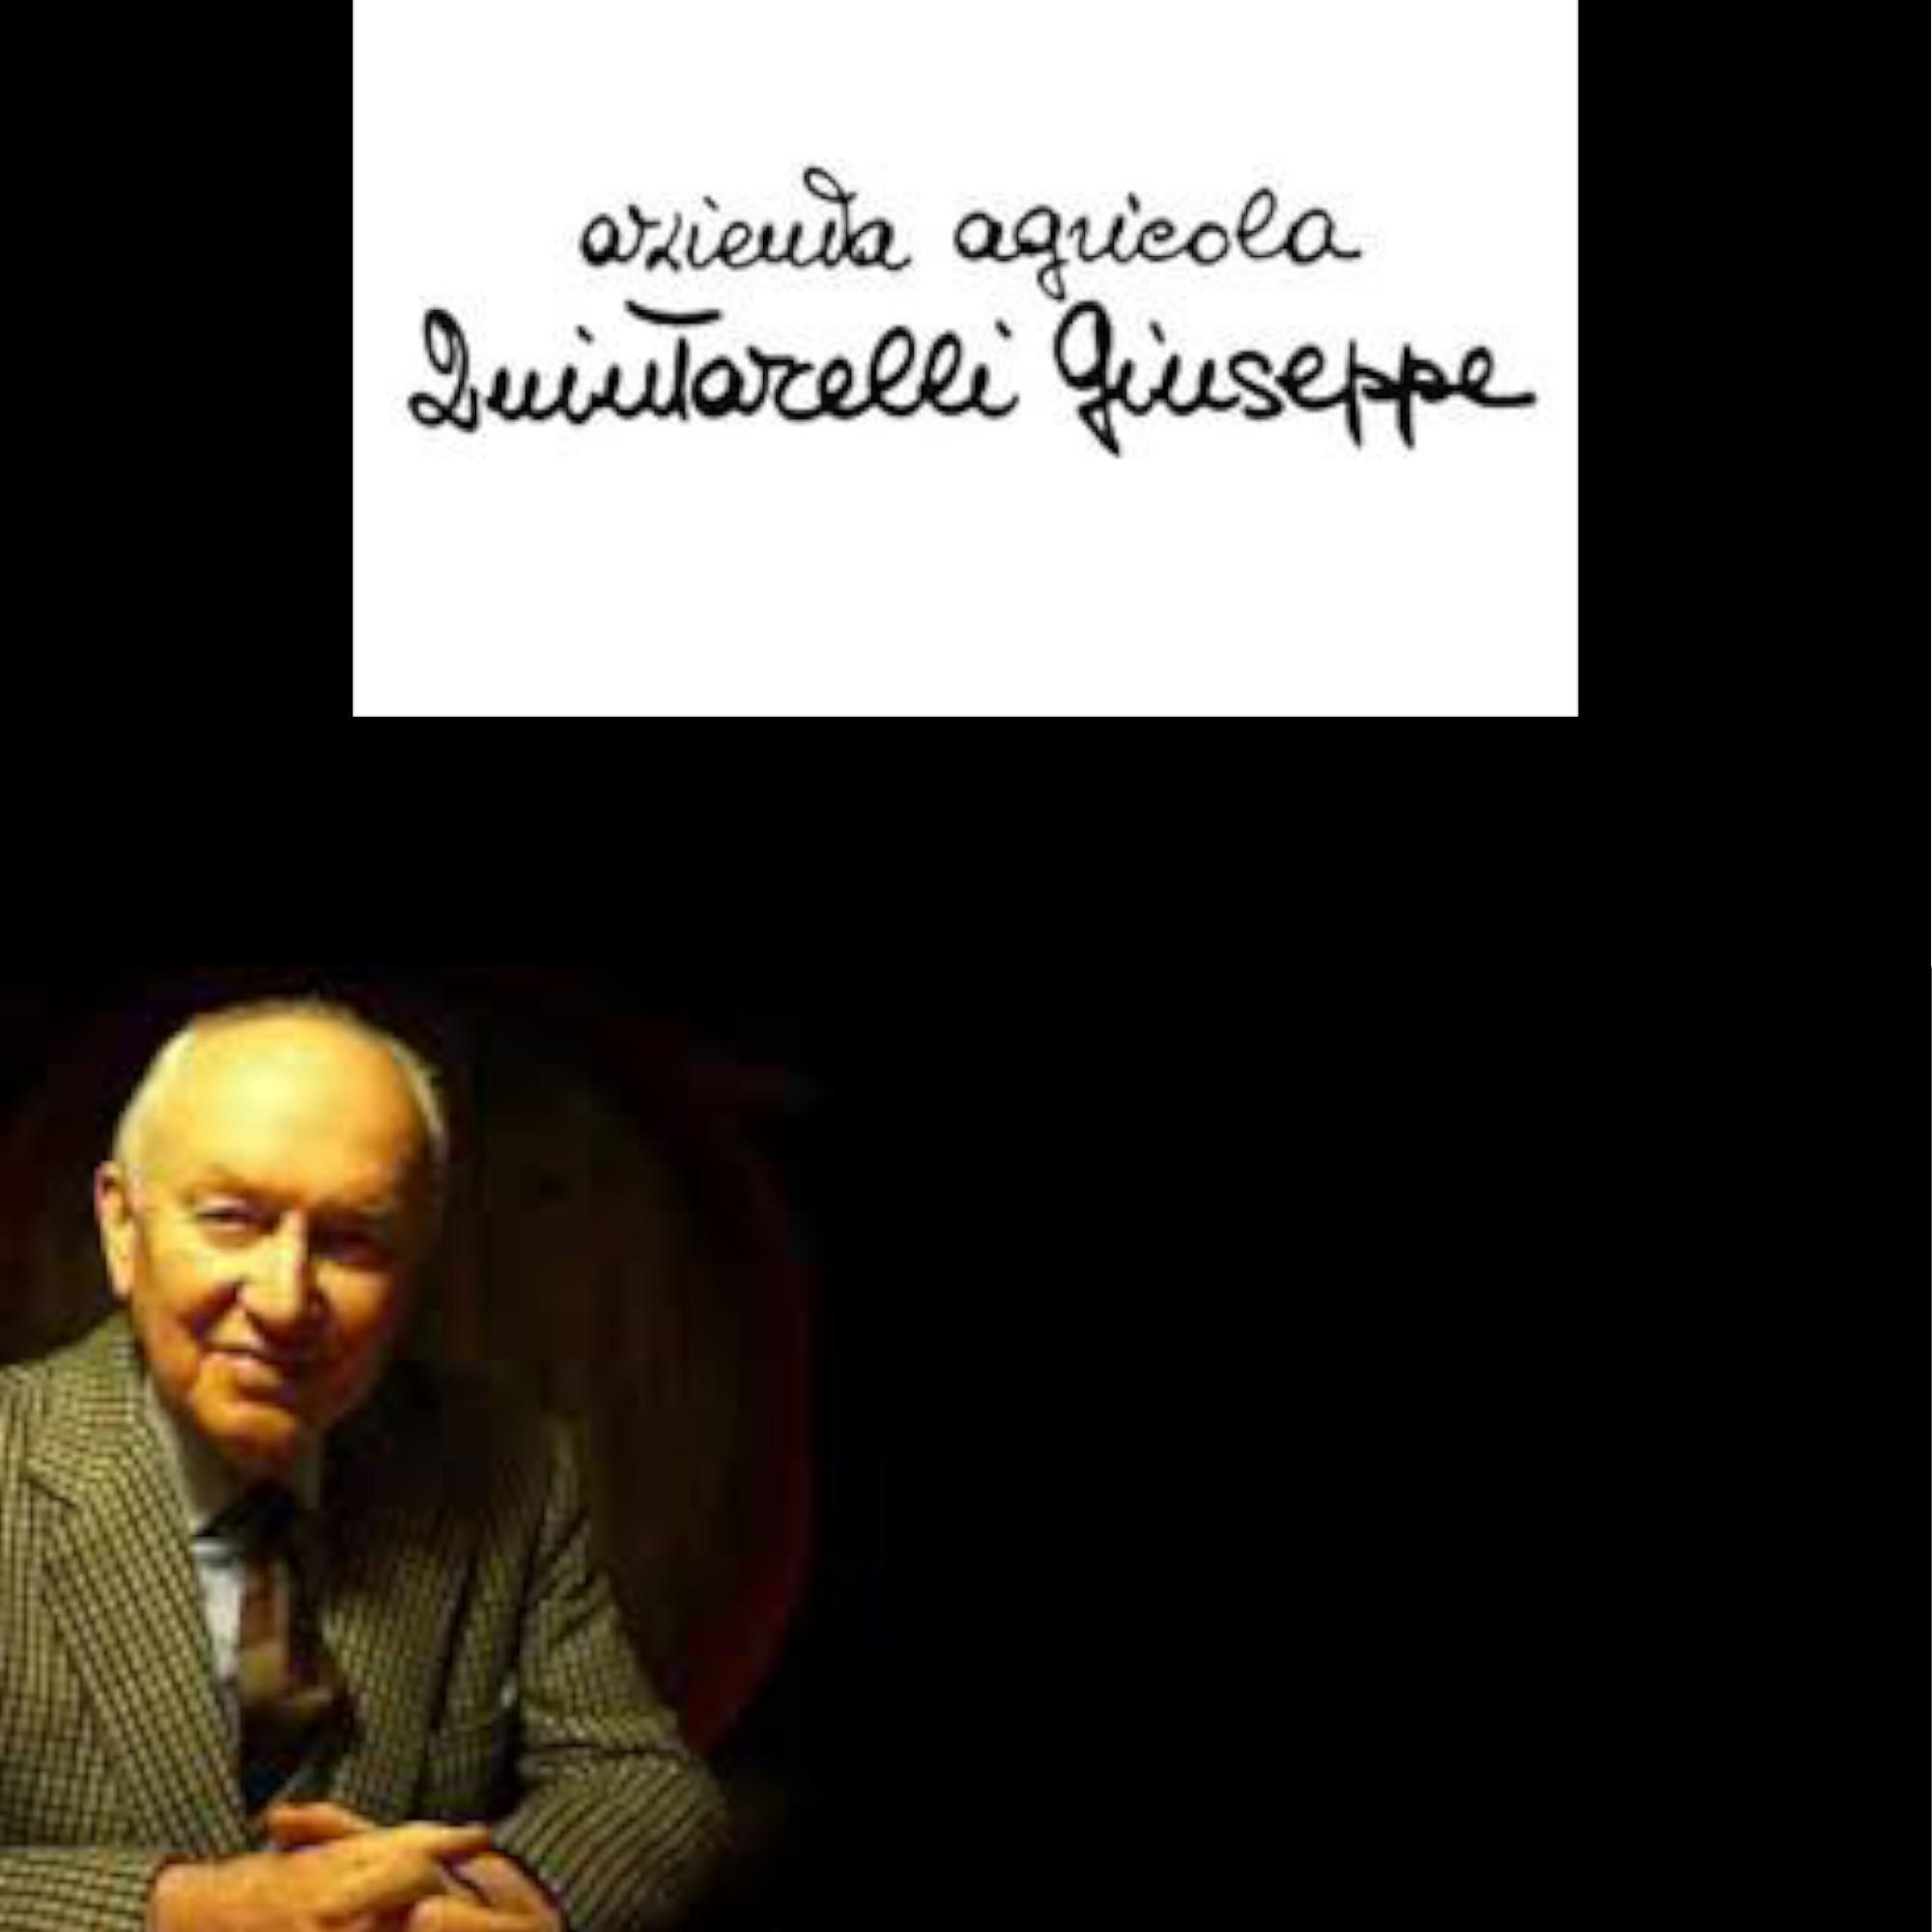 Azienda agricola Quintarelli Giuseppe